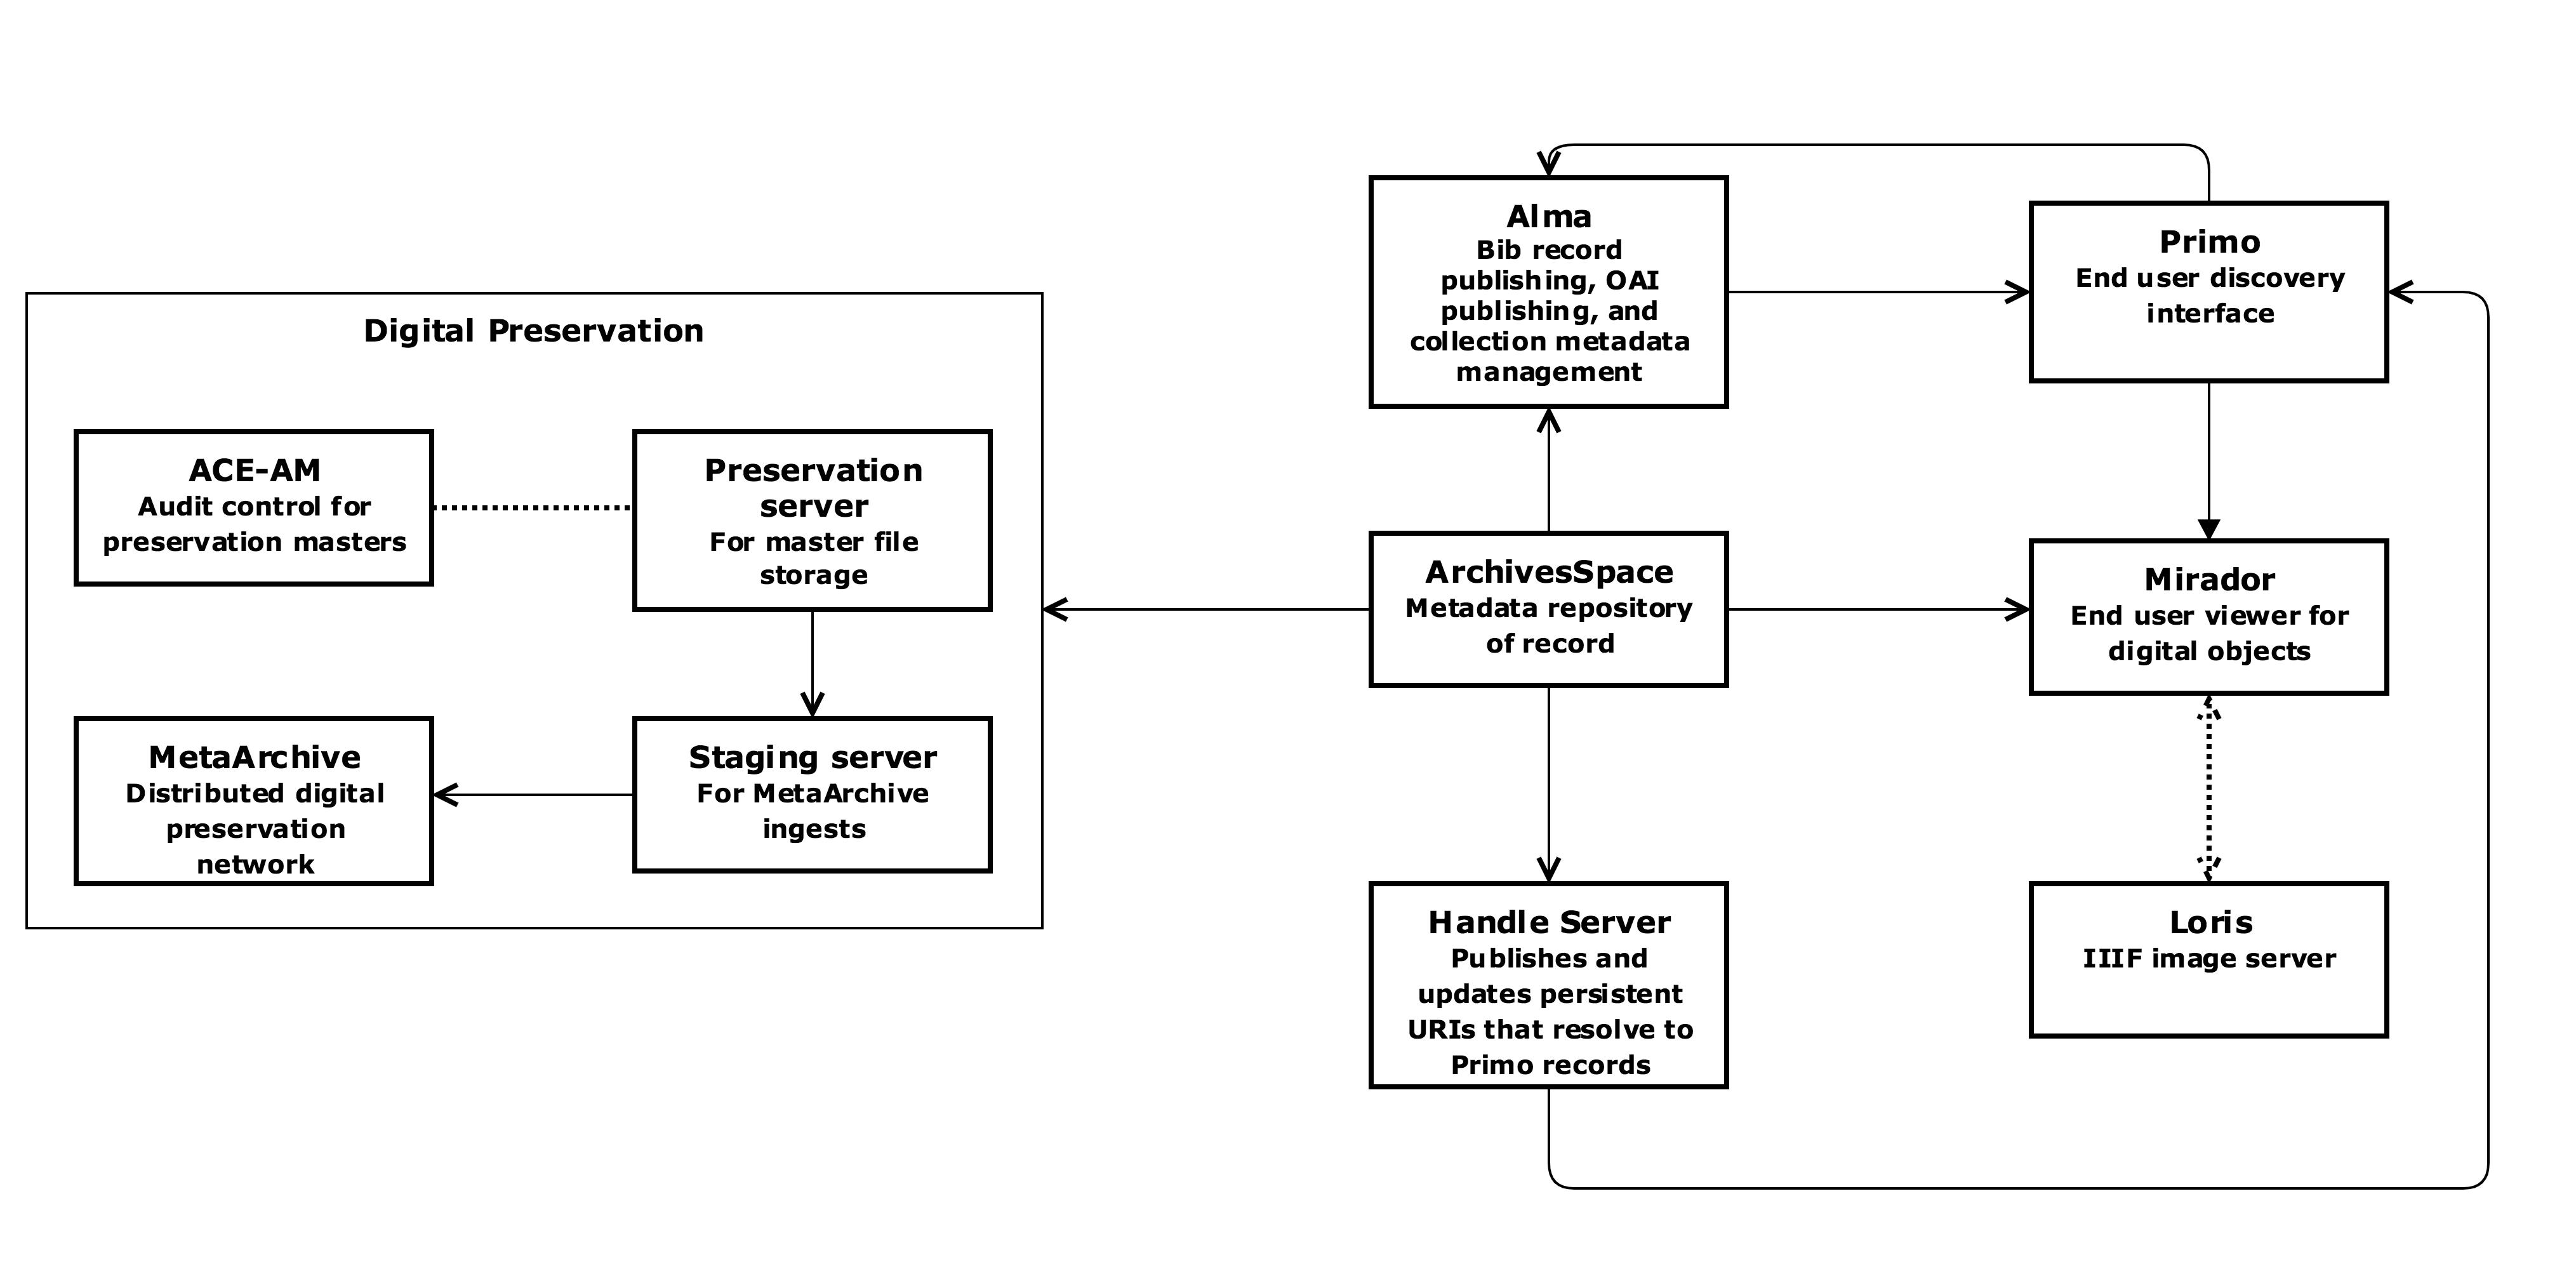 System model diagram